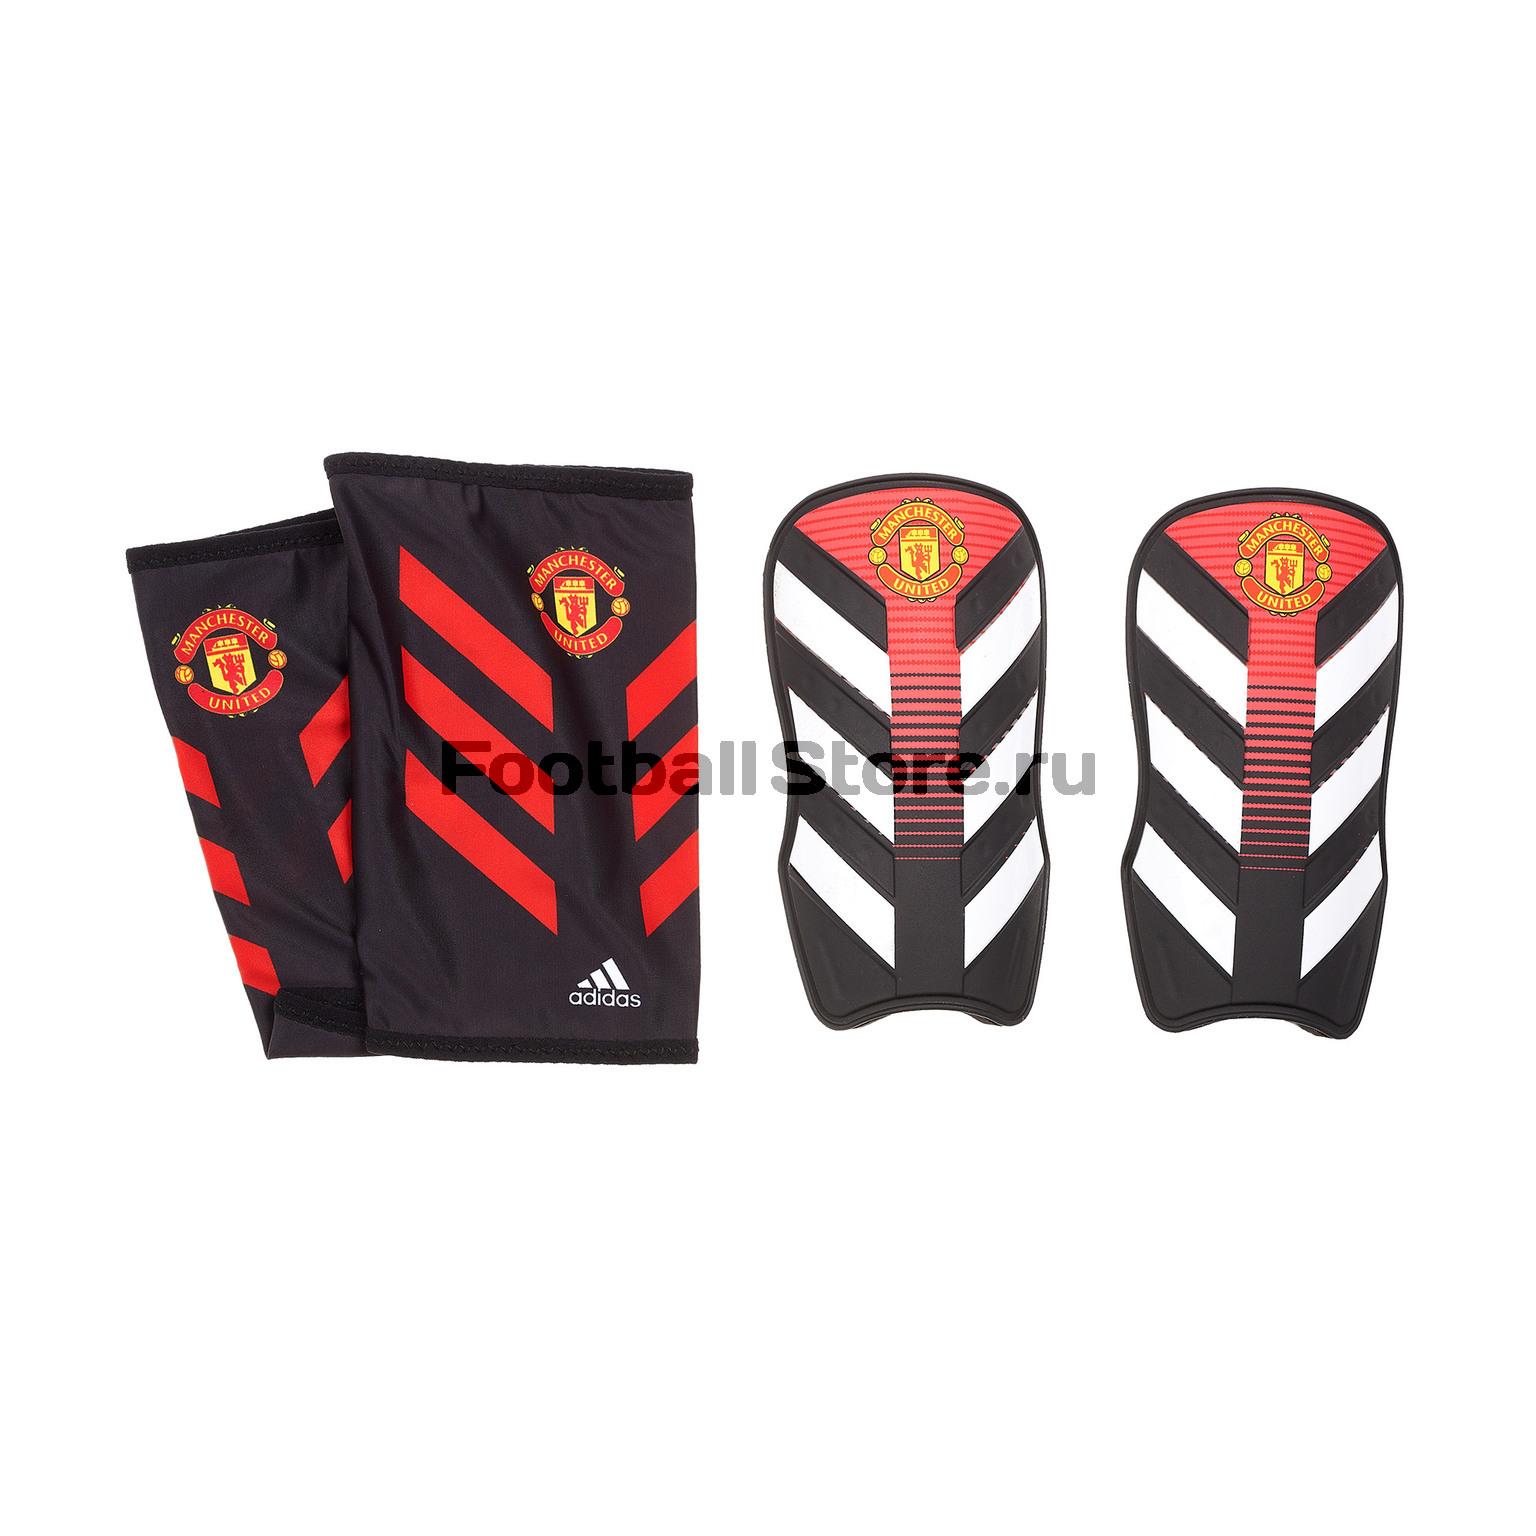 Щитки Adidas Manchester United CW9704 рюкзак adidas manchester united cy5581